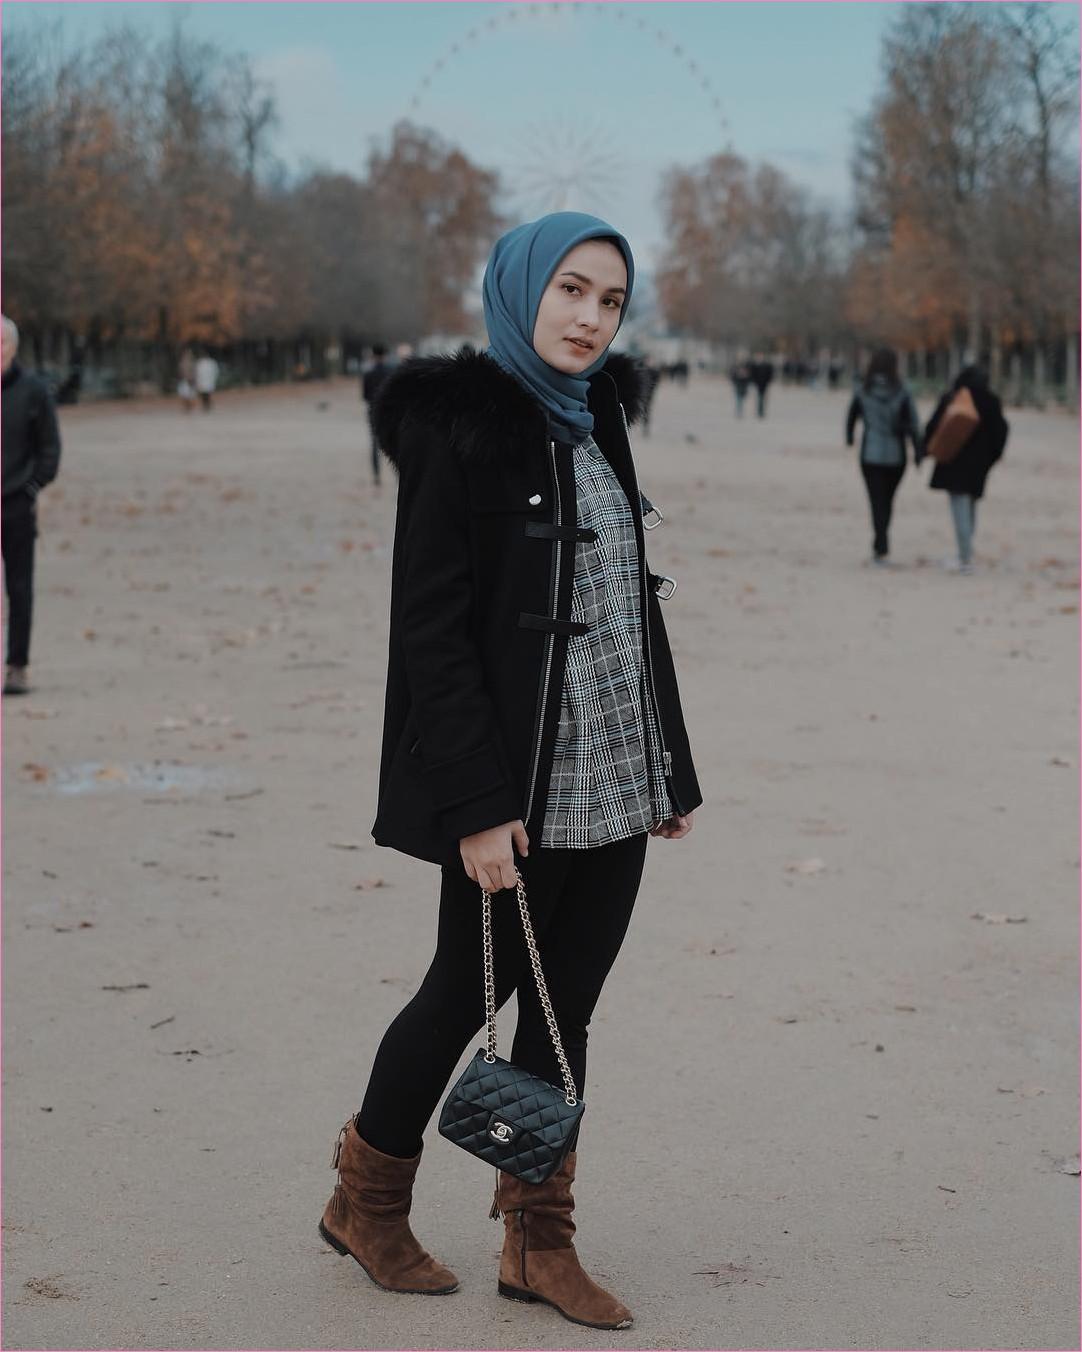 Outfit Baju Traveler Berhijab untuk Keluar Negri Ala Selebgram 2018 segiempat square hijab biru jacket bulu legging slingbags channel hitam kemeja kotak kain flannel boots  bulu heels coklat tua outfit ootd trendy london coat